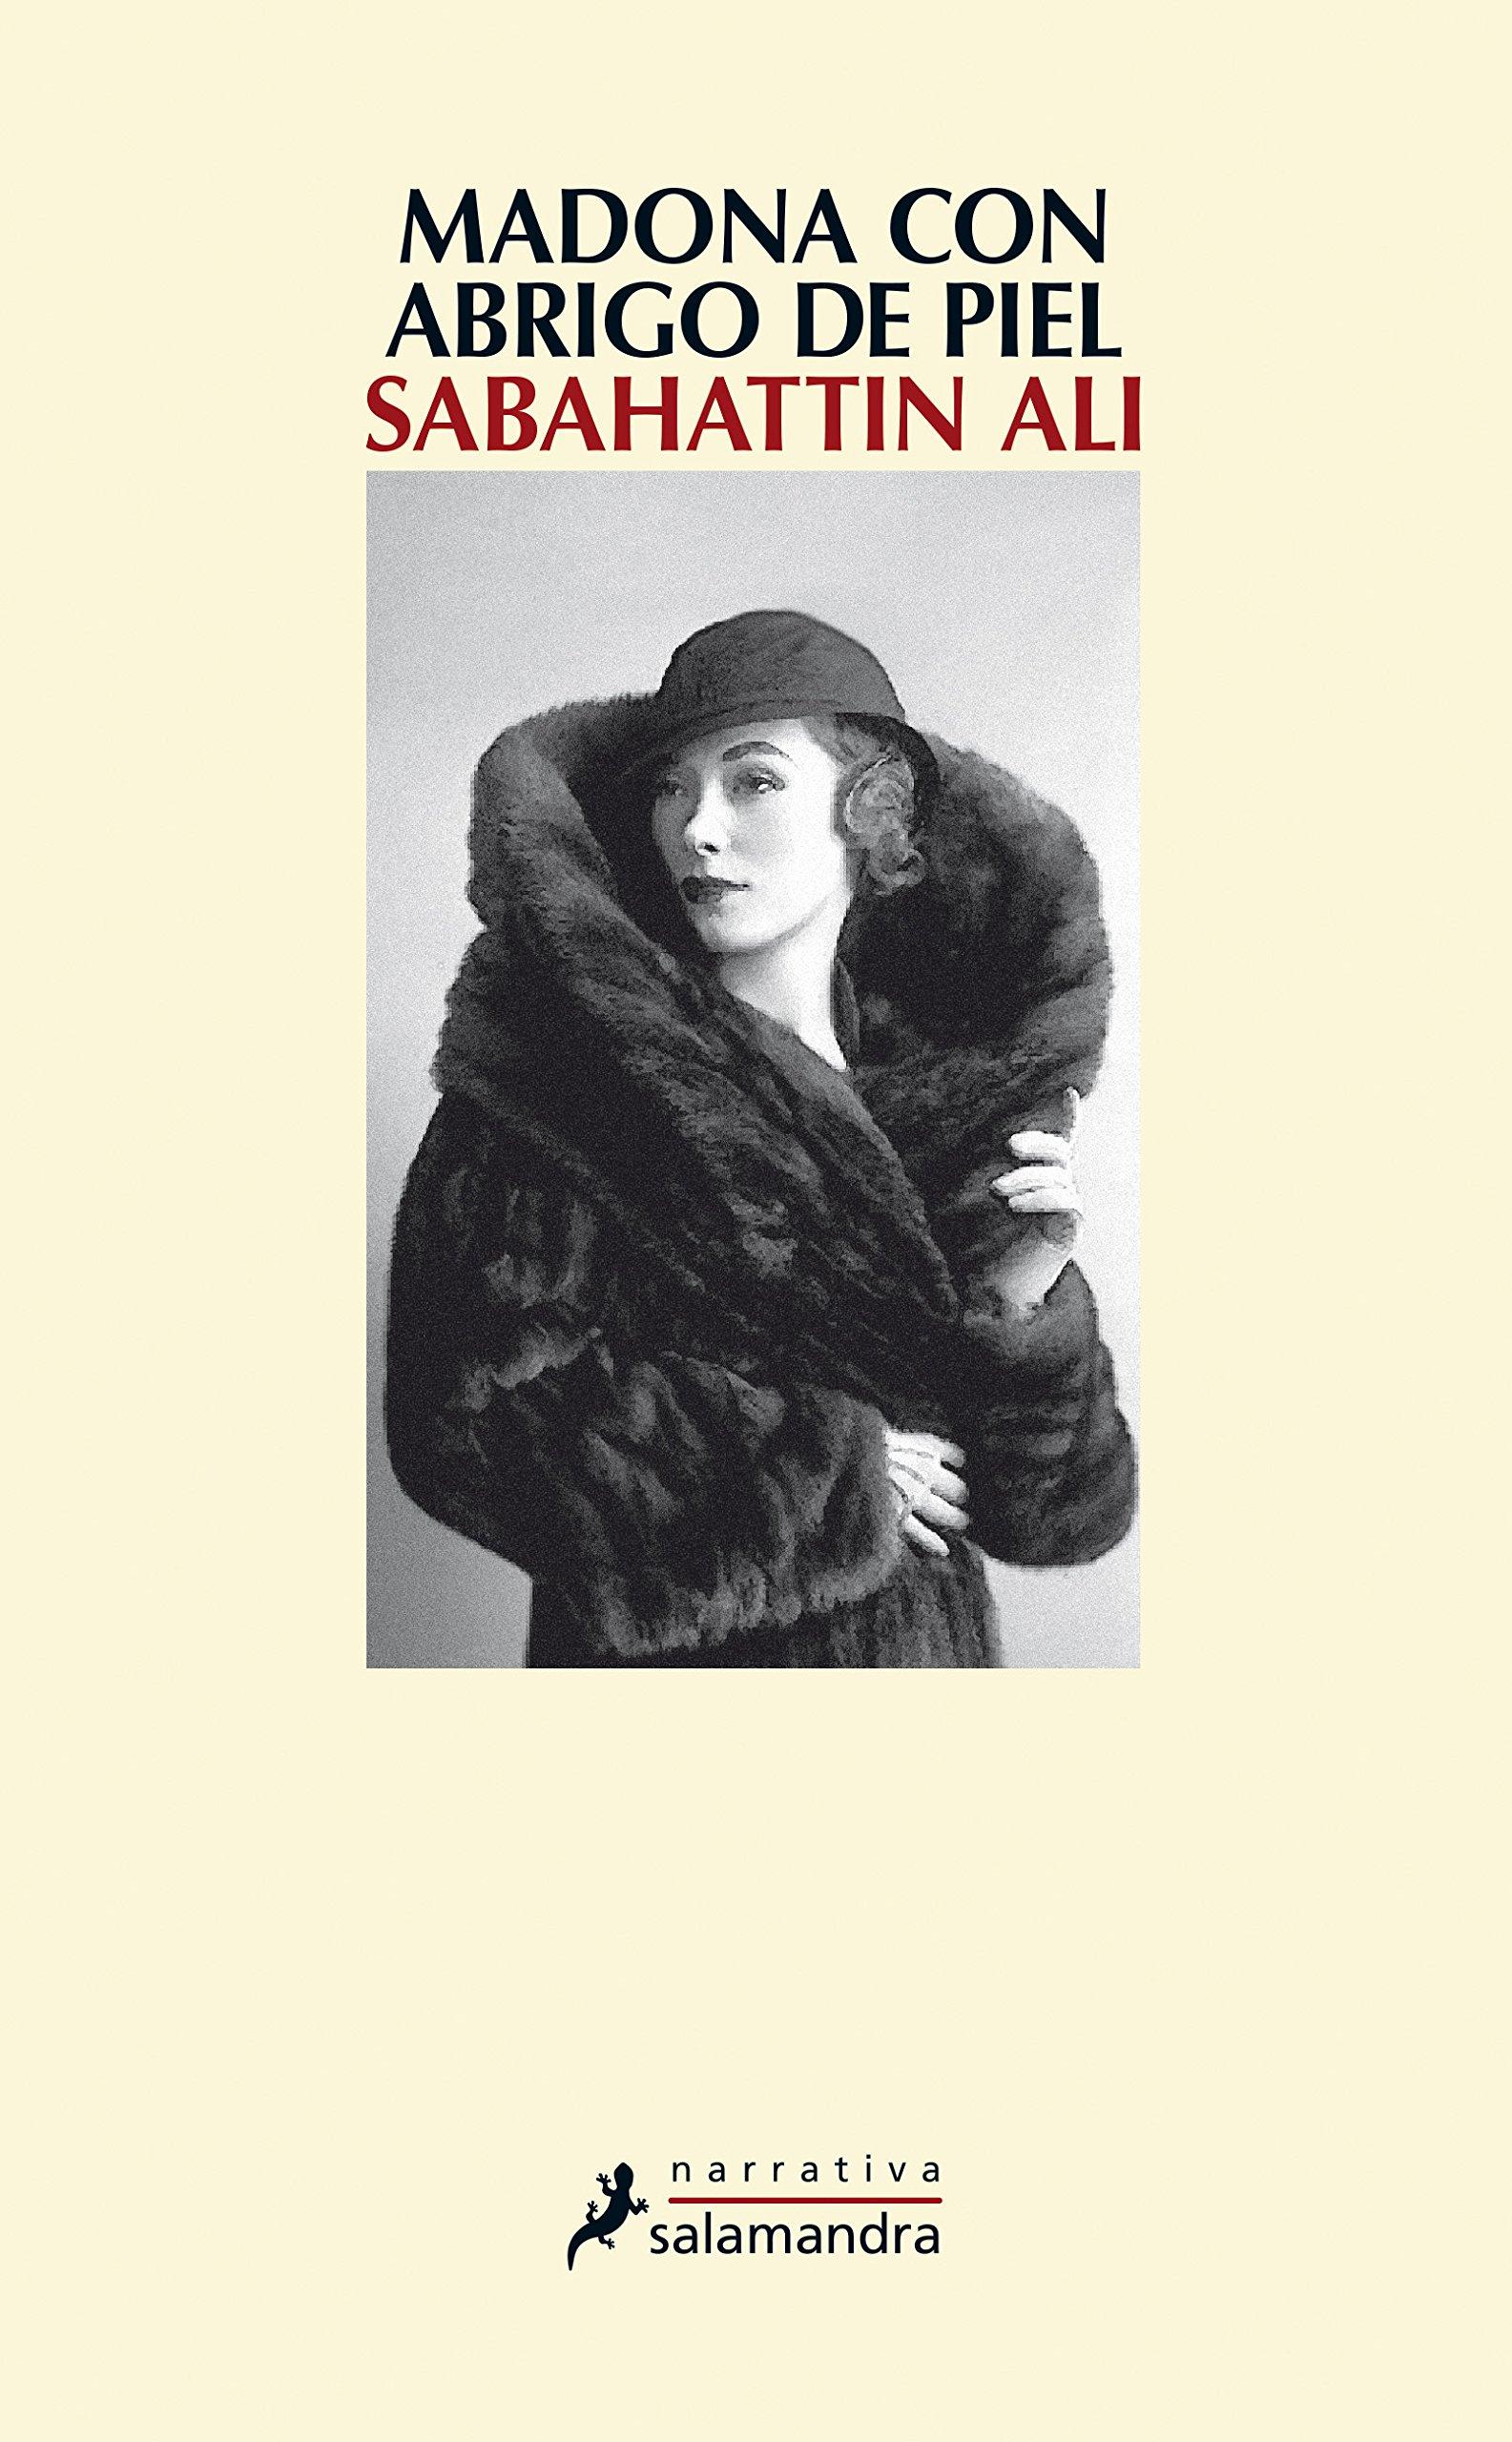 Madonna con abrigo de piel (Spanish Edition) (Spanish) Paperback – April 30, 2018